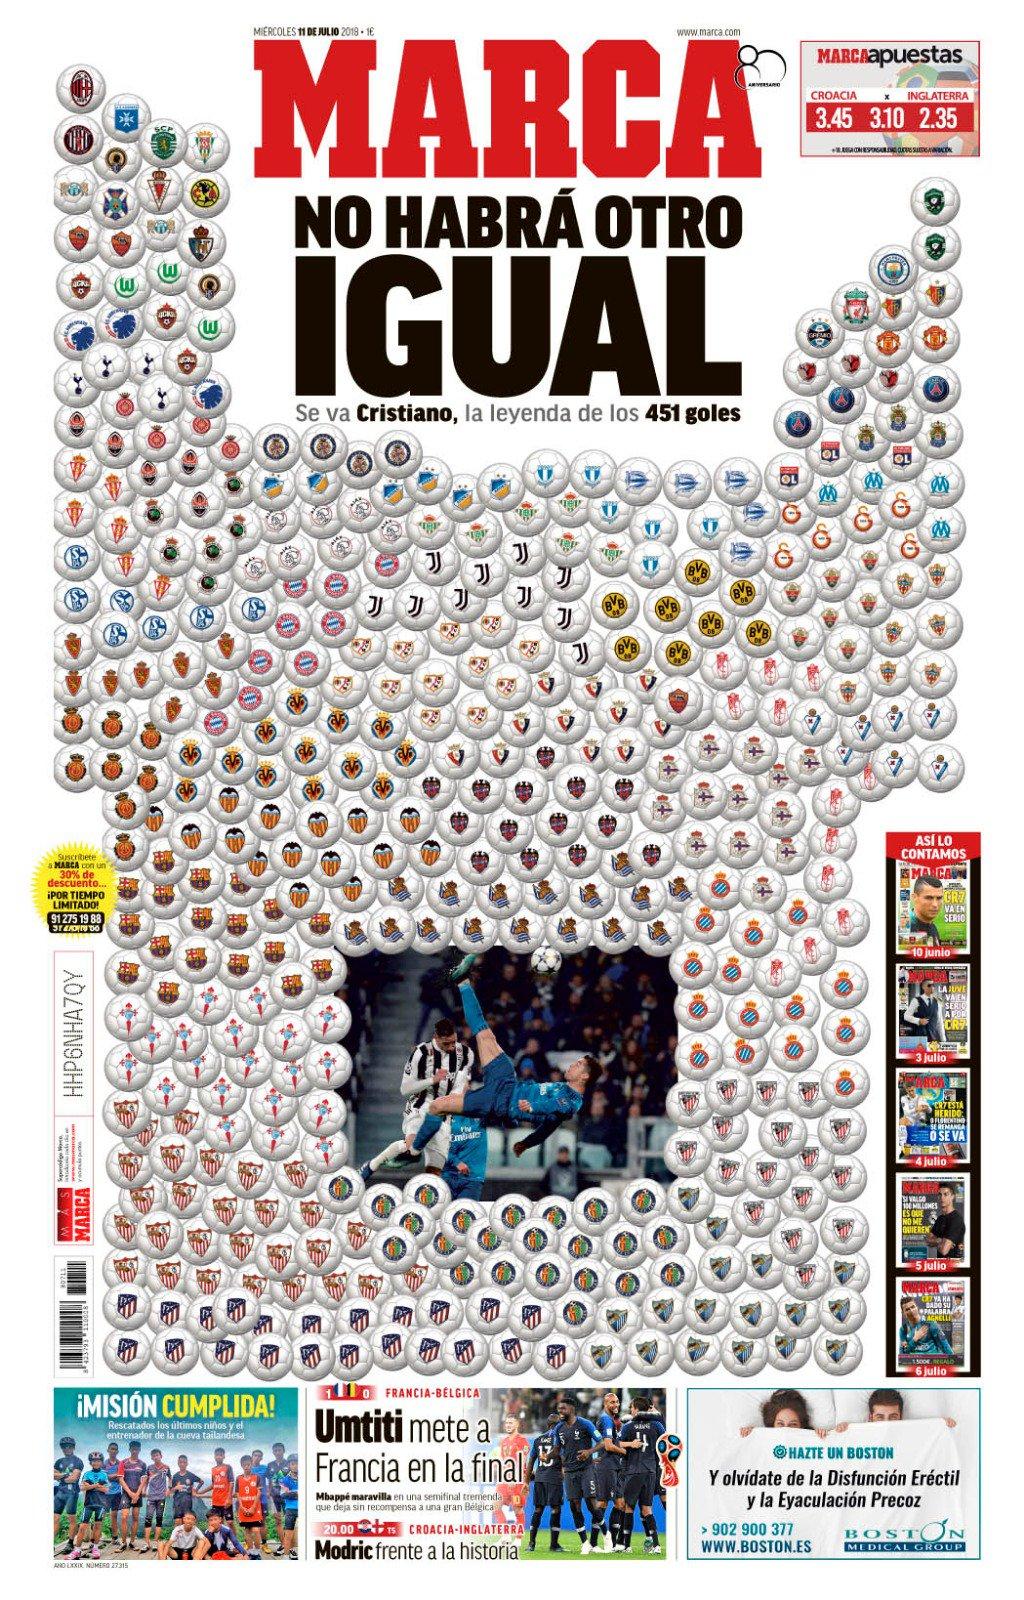 #LaPortada No habrá otro igual #AdiósLeyenda https://t.co/9dkjko9kE5